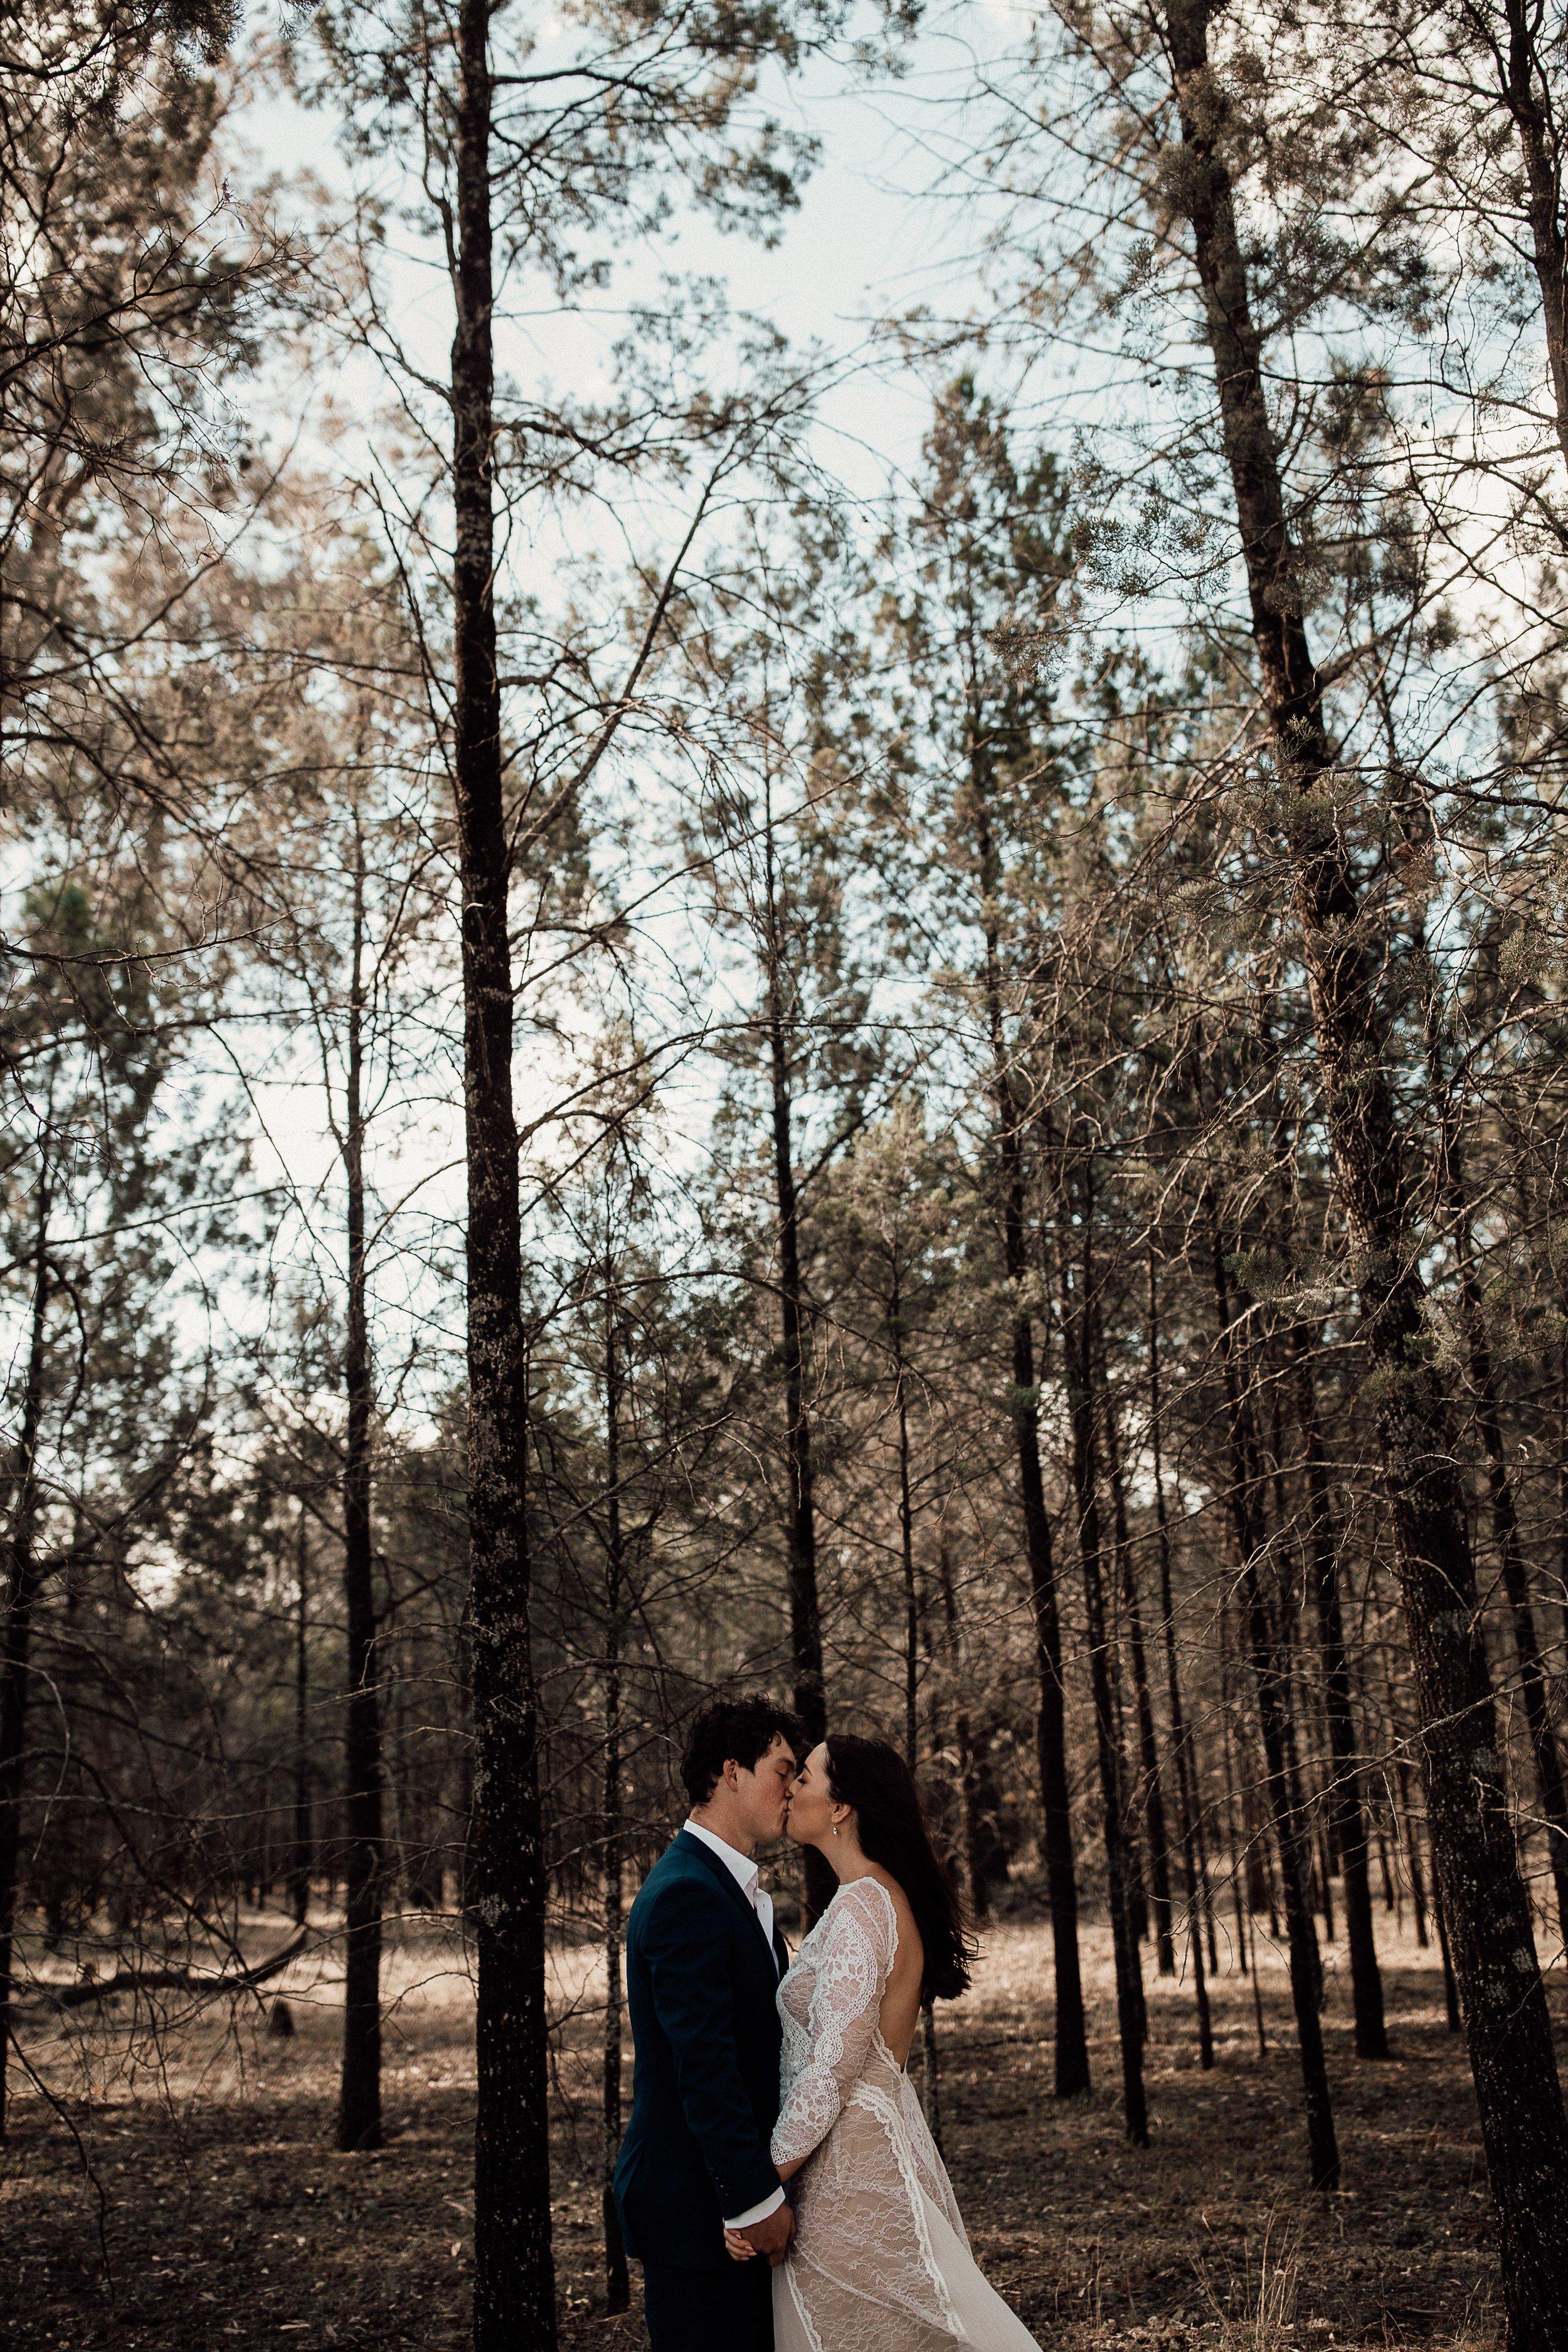 mickalathomas_puremacphotography_weddingphotographer_couplephotographer_Sheppartonphotographer_1506.jpg